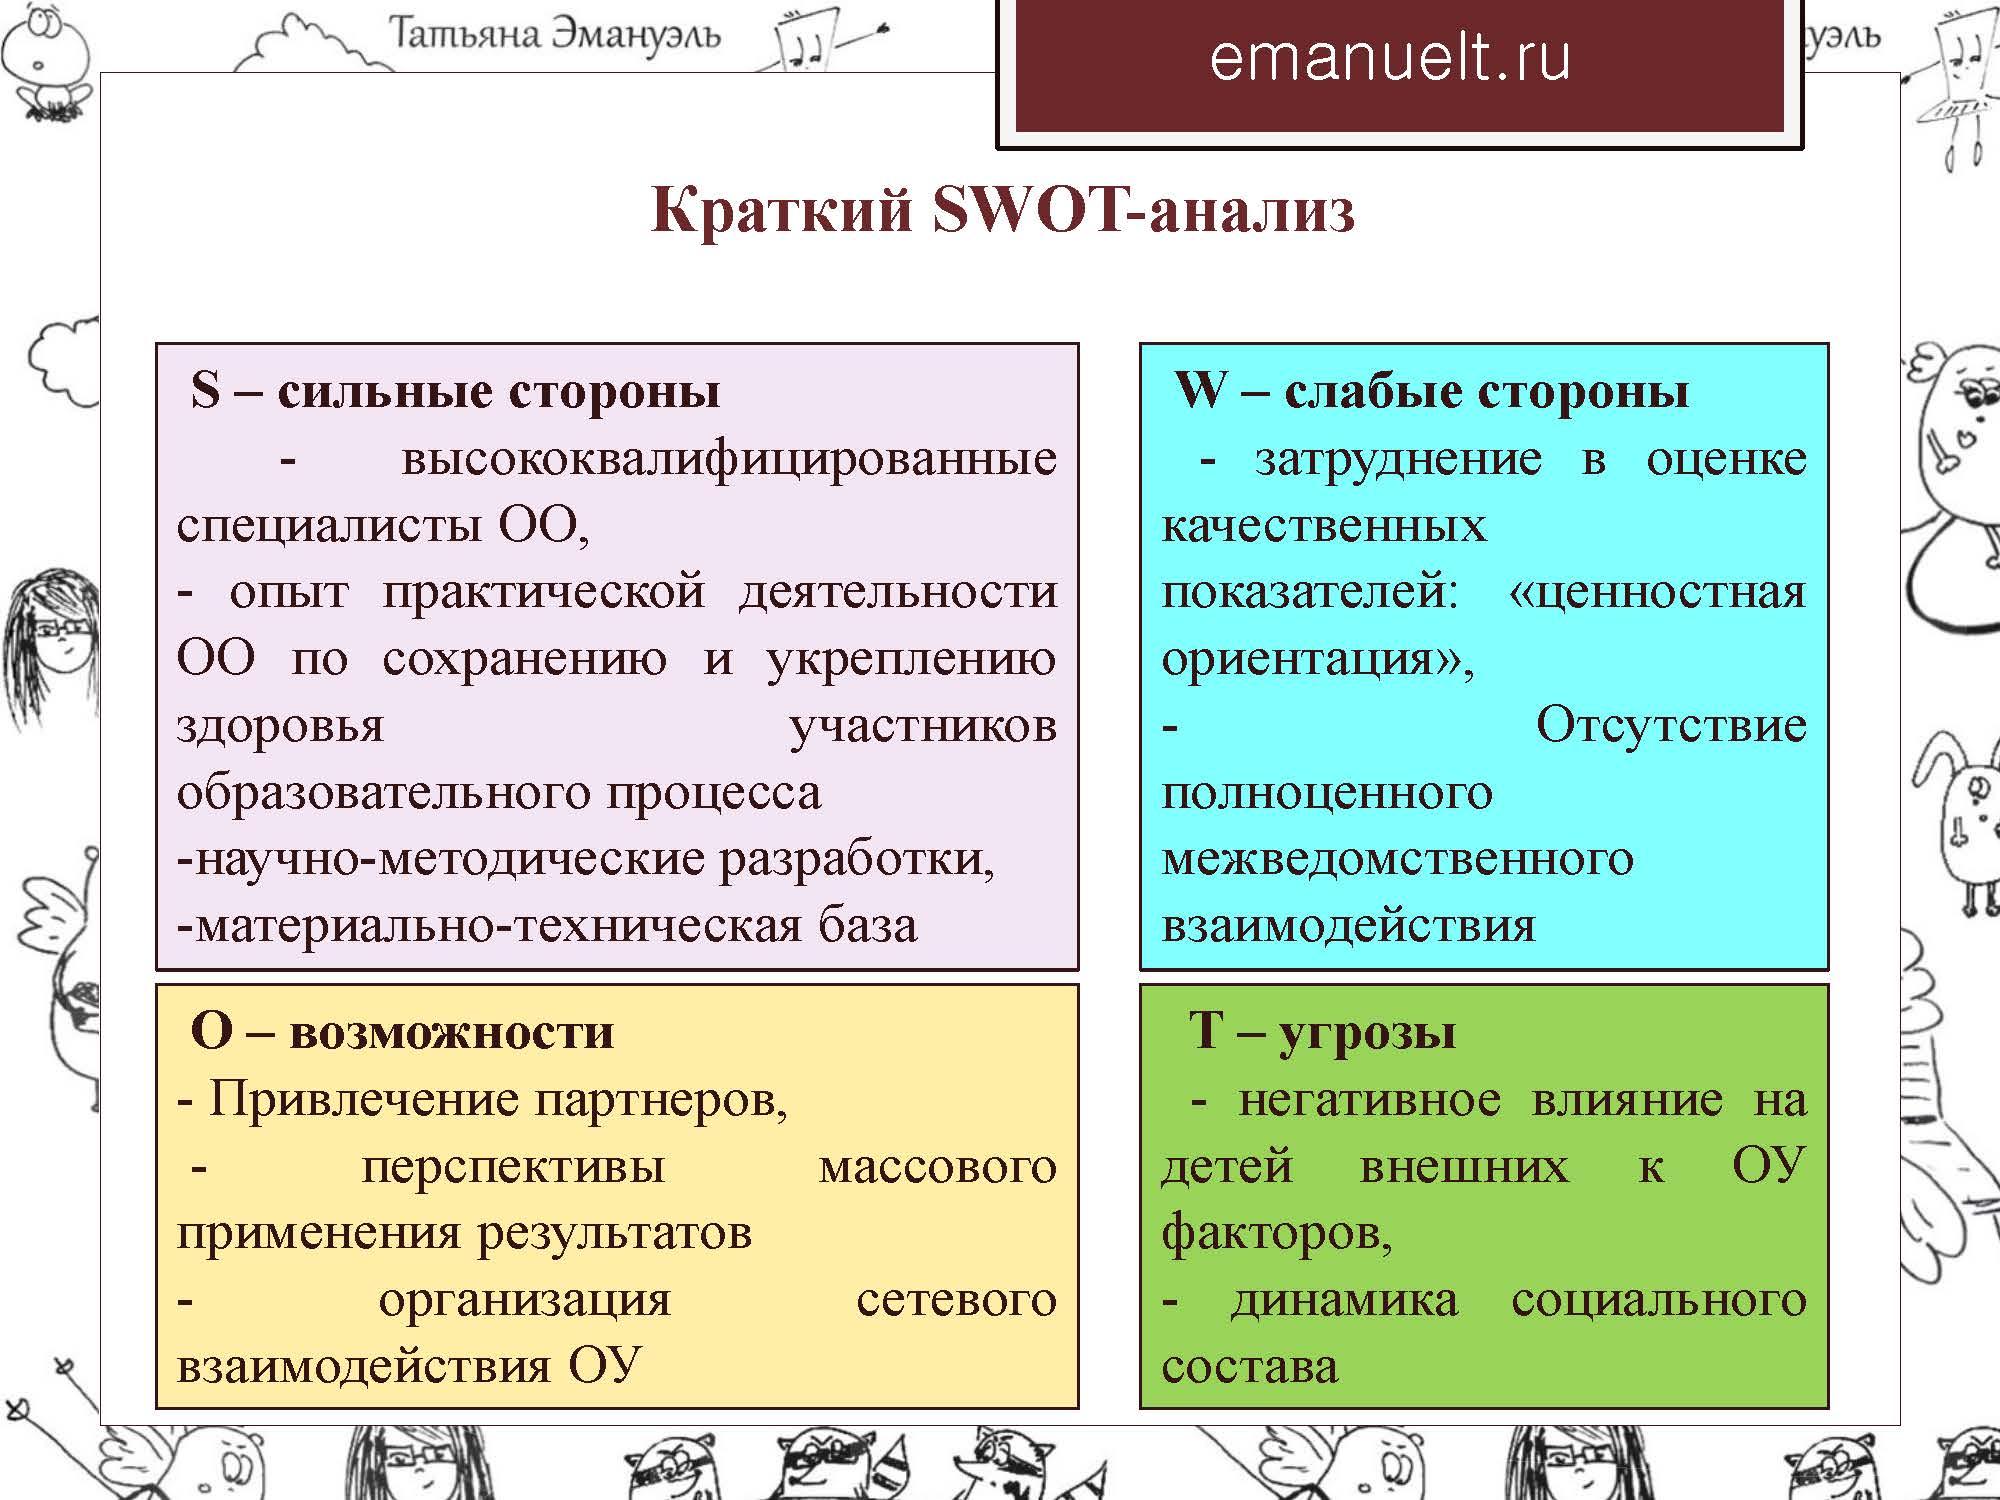 06 февраля эмануэль_Страница_039